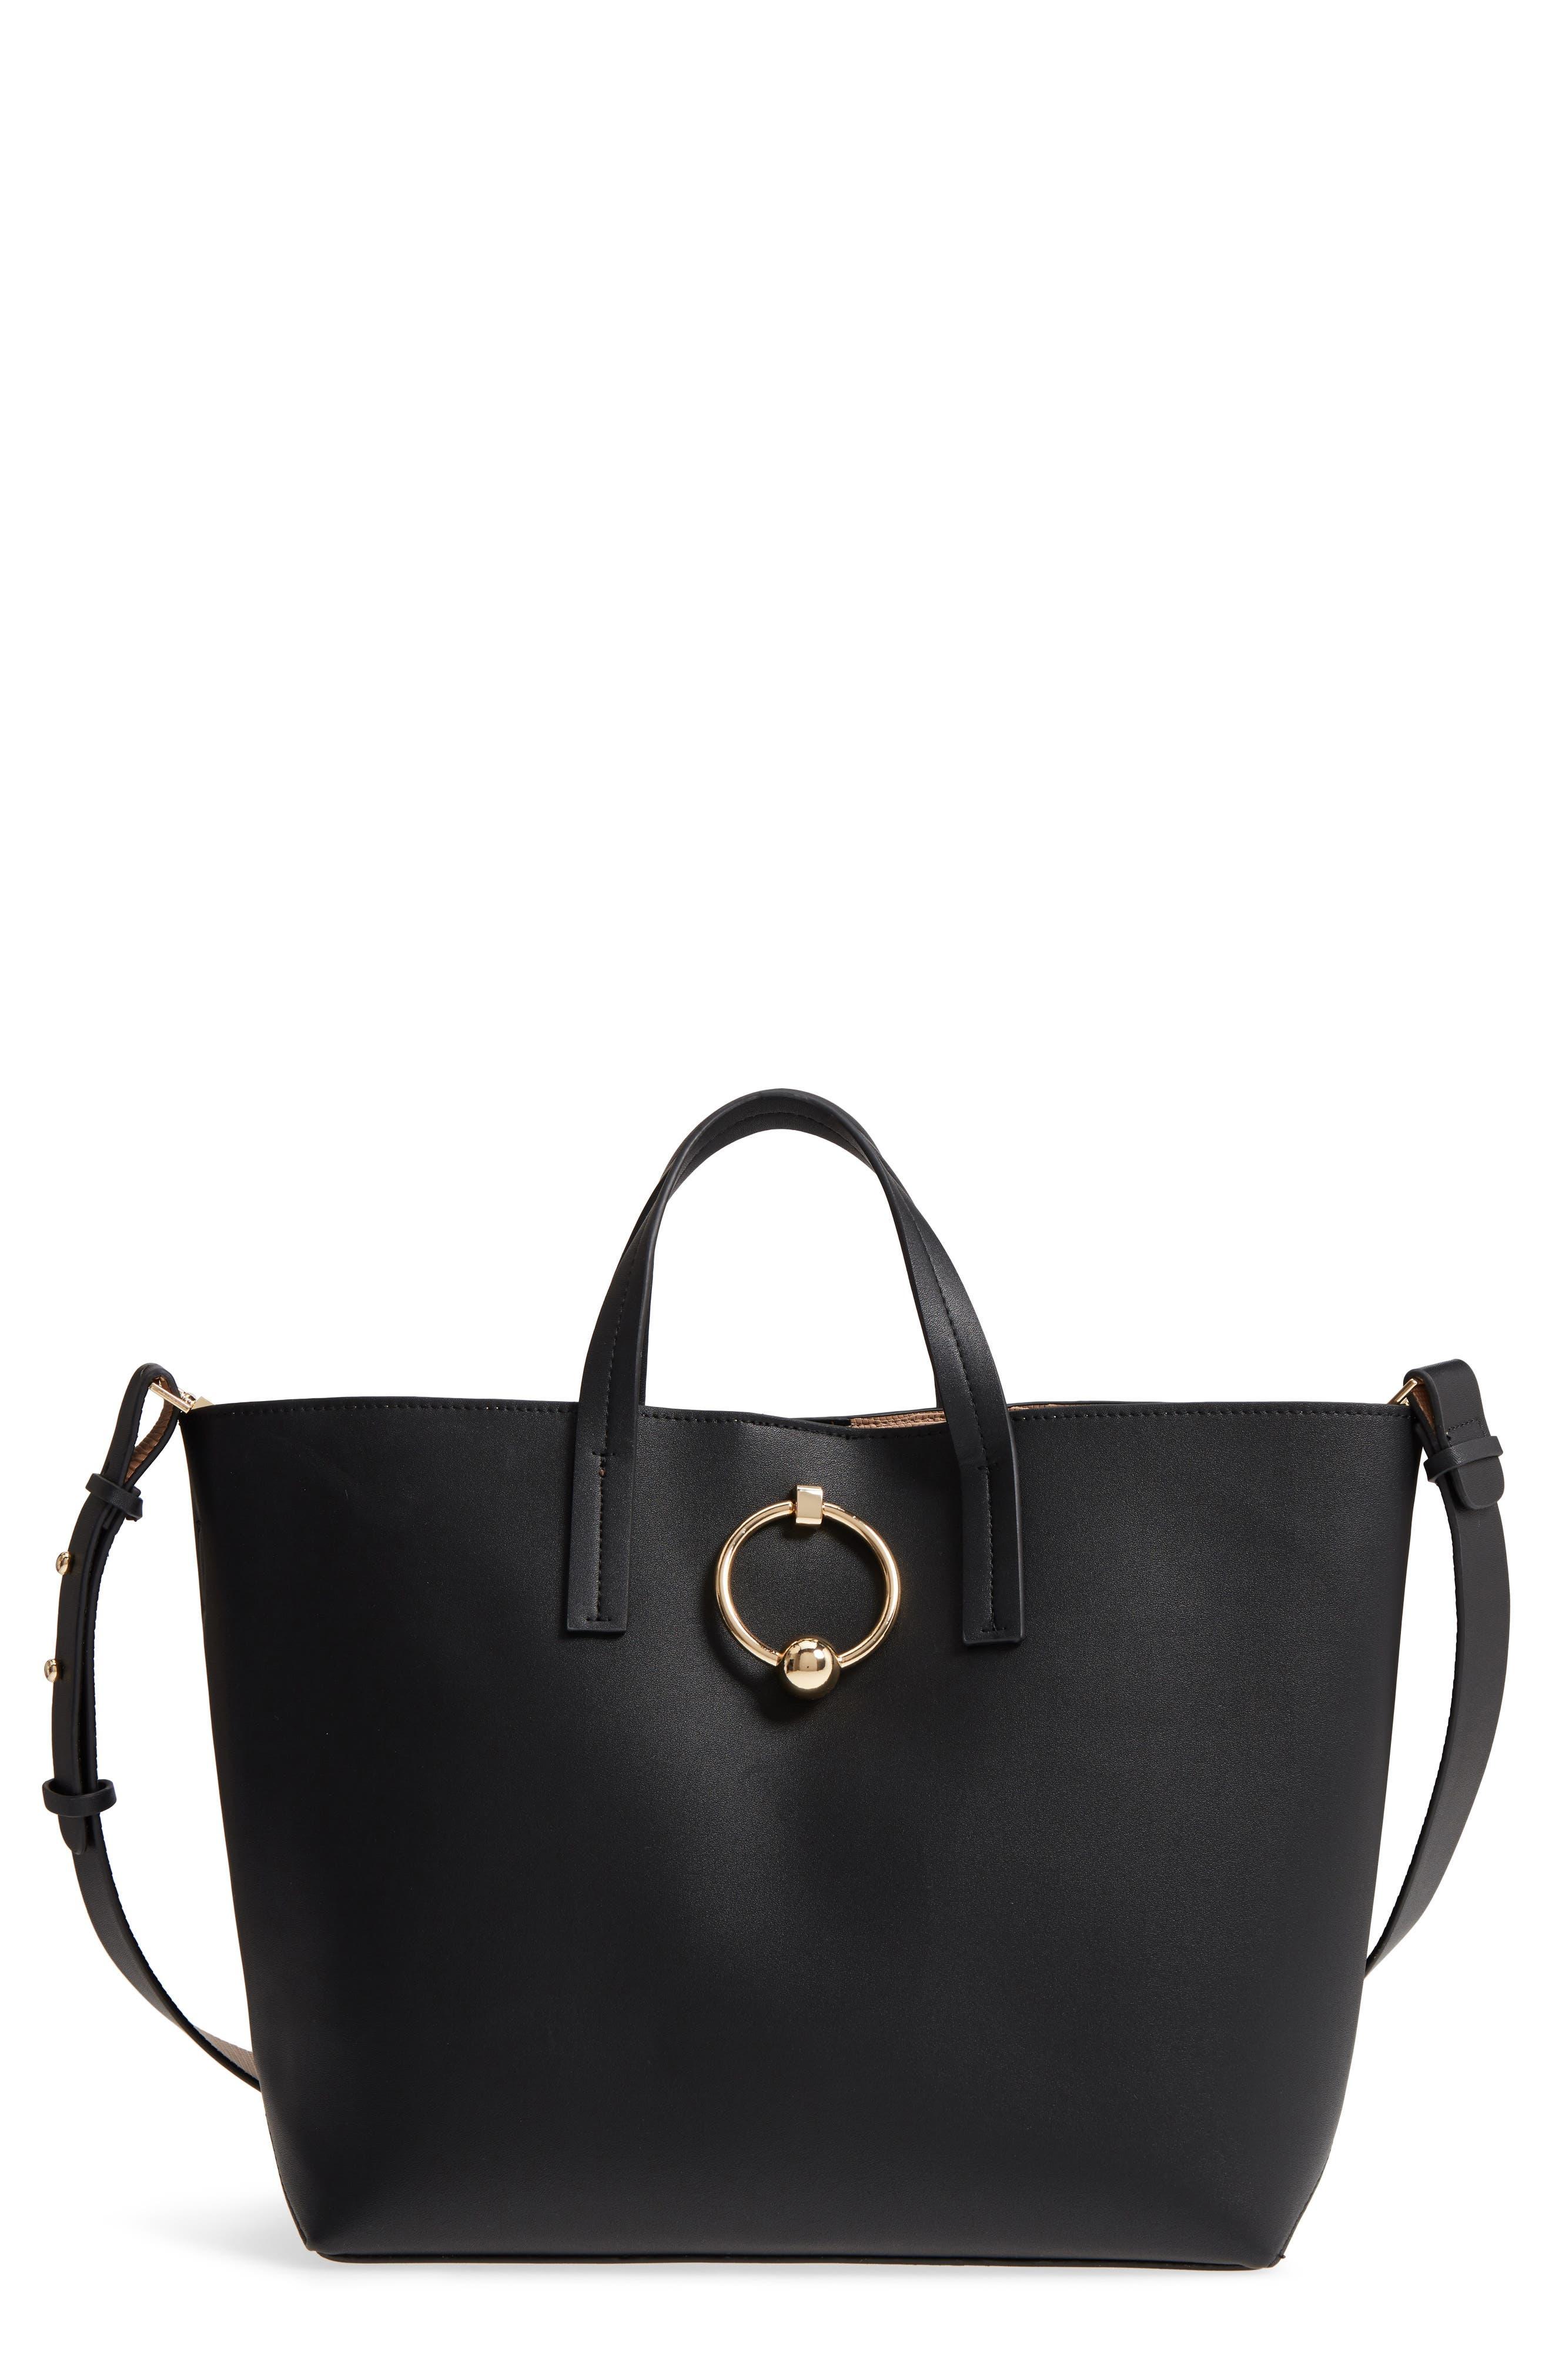 Seline Tote Bag,                             Main thumbnail 1, color,                             Black